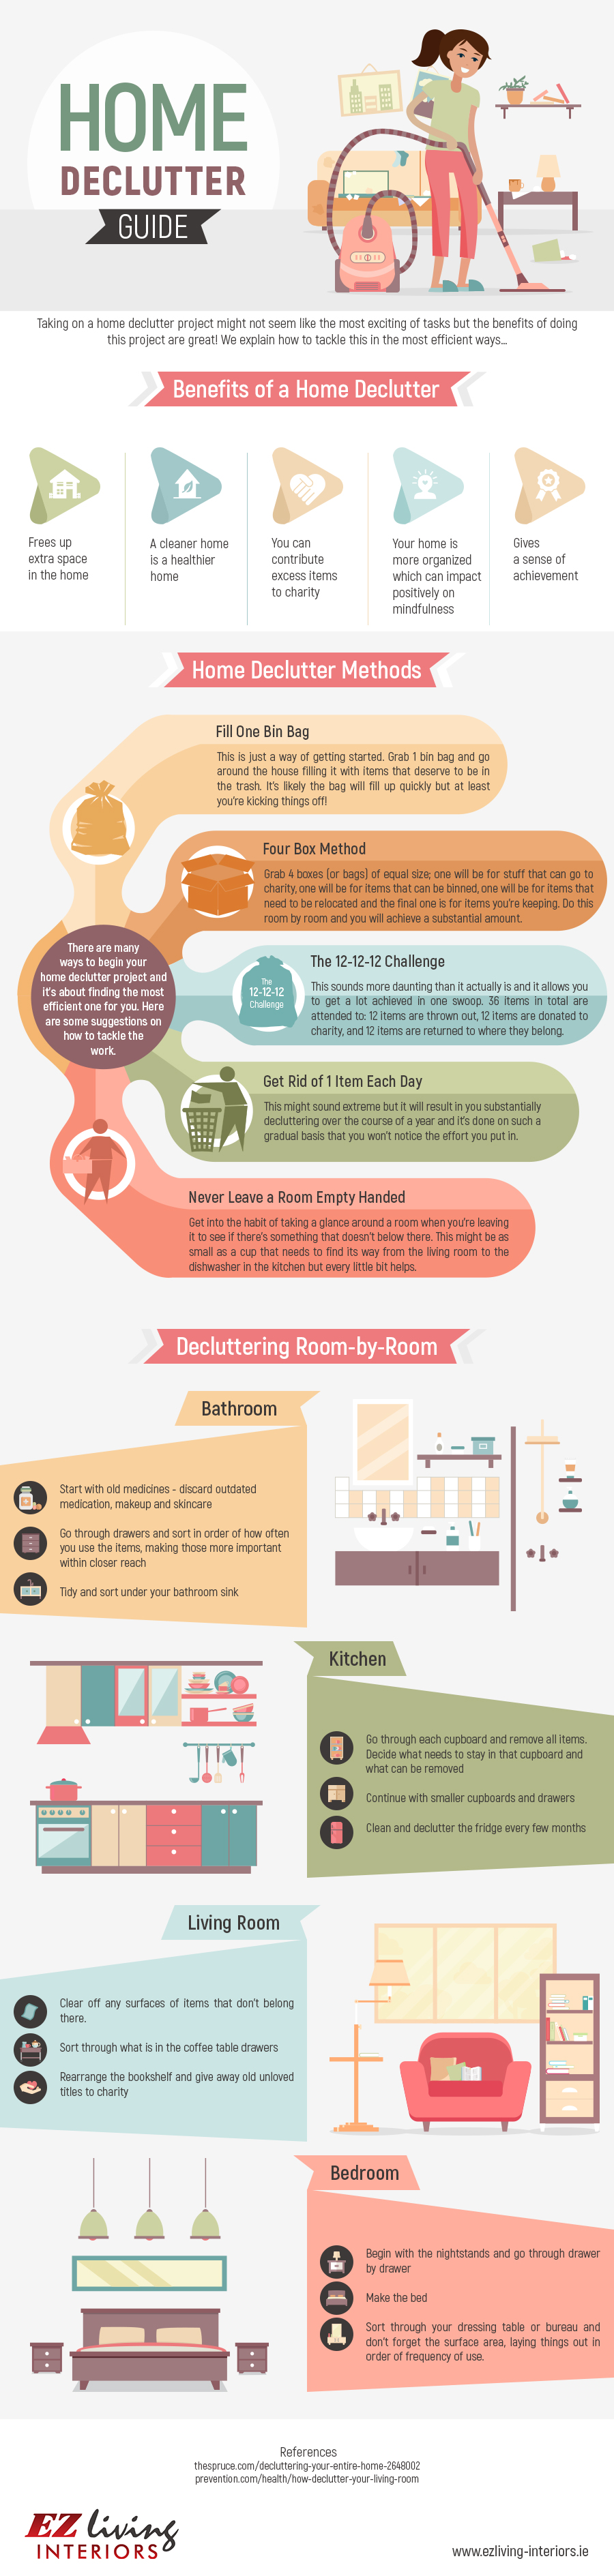 Helen OKeefe_home-declutter-guide-ie-infographic.jpg